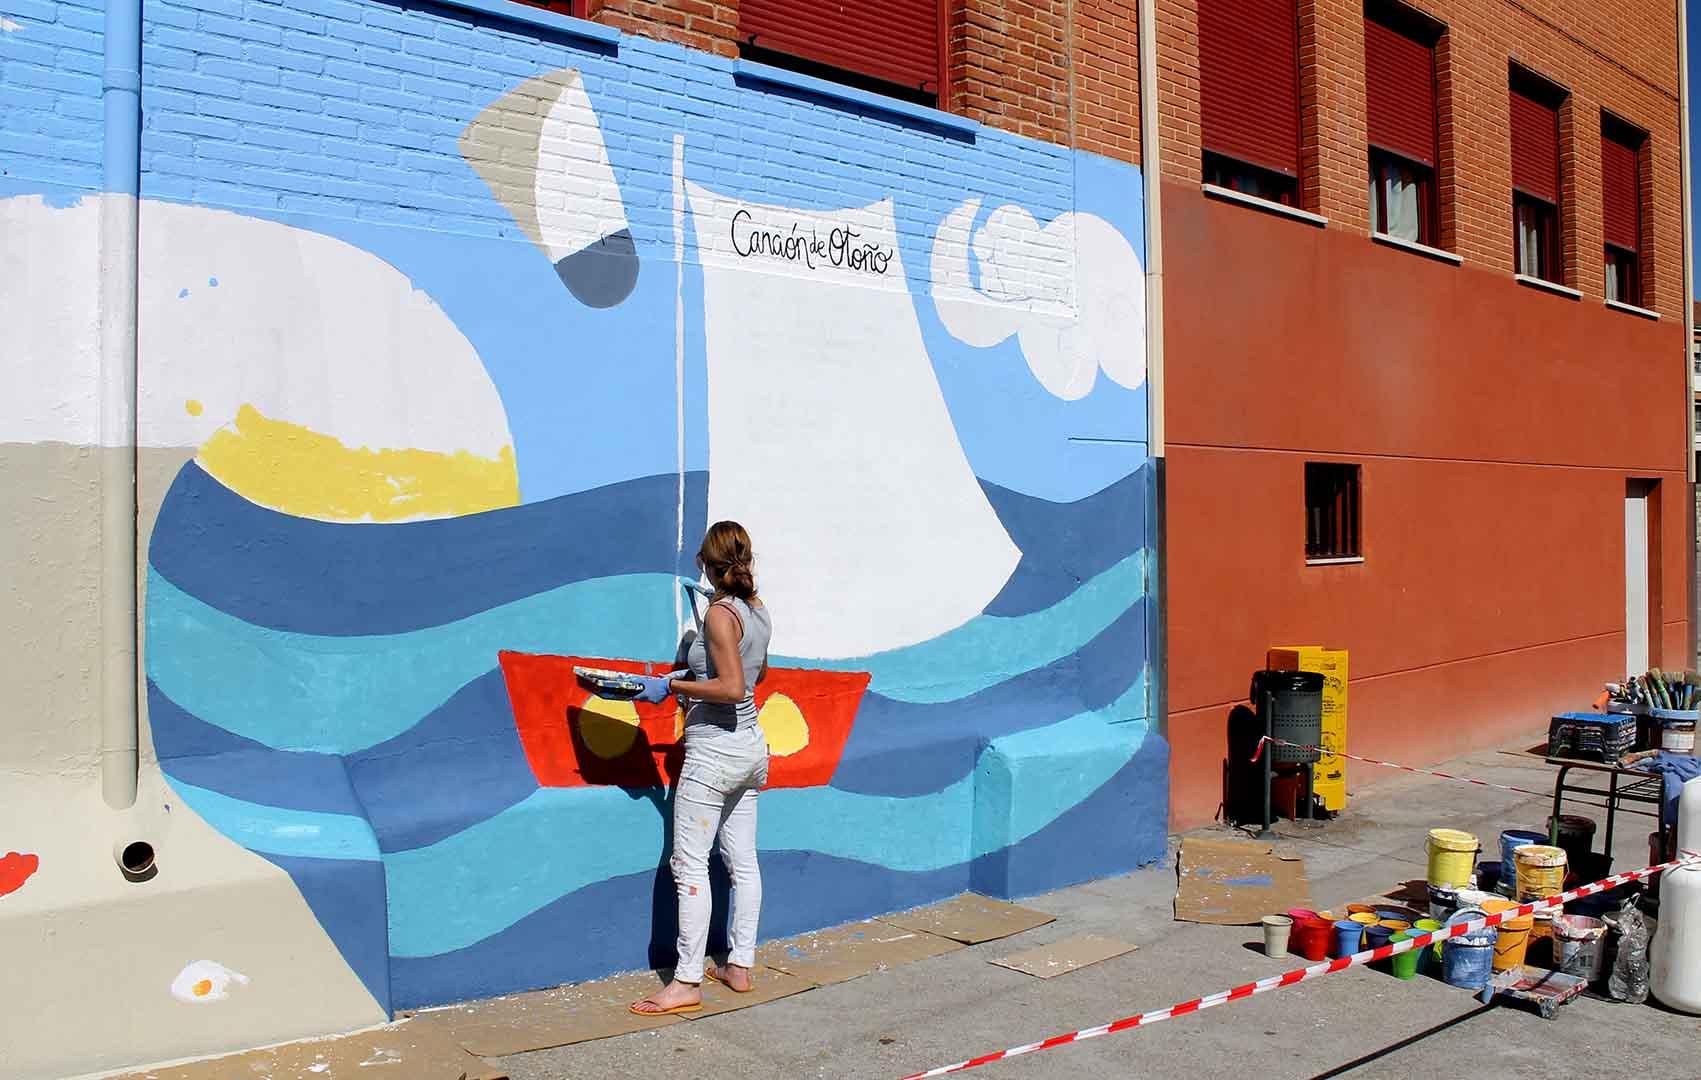 mural izas dibujando la palabra zamora 4